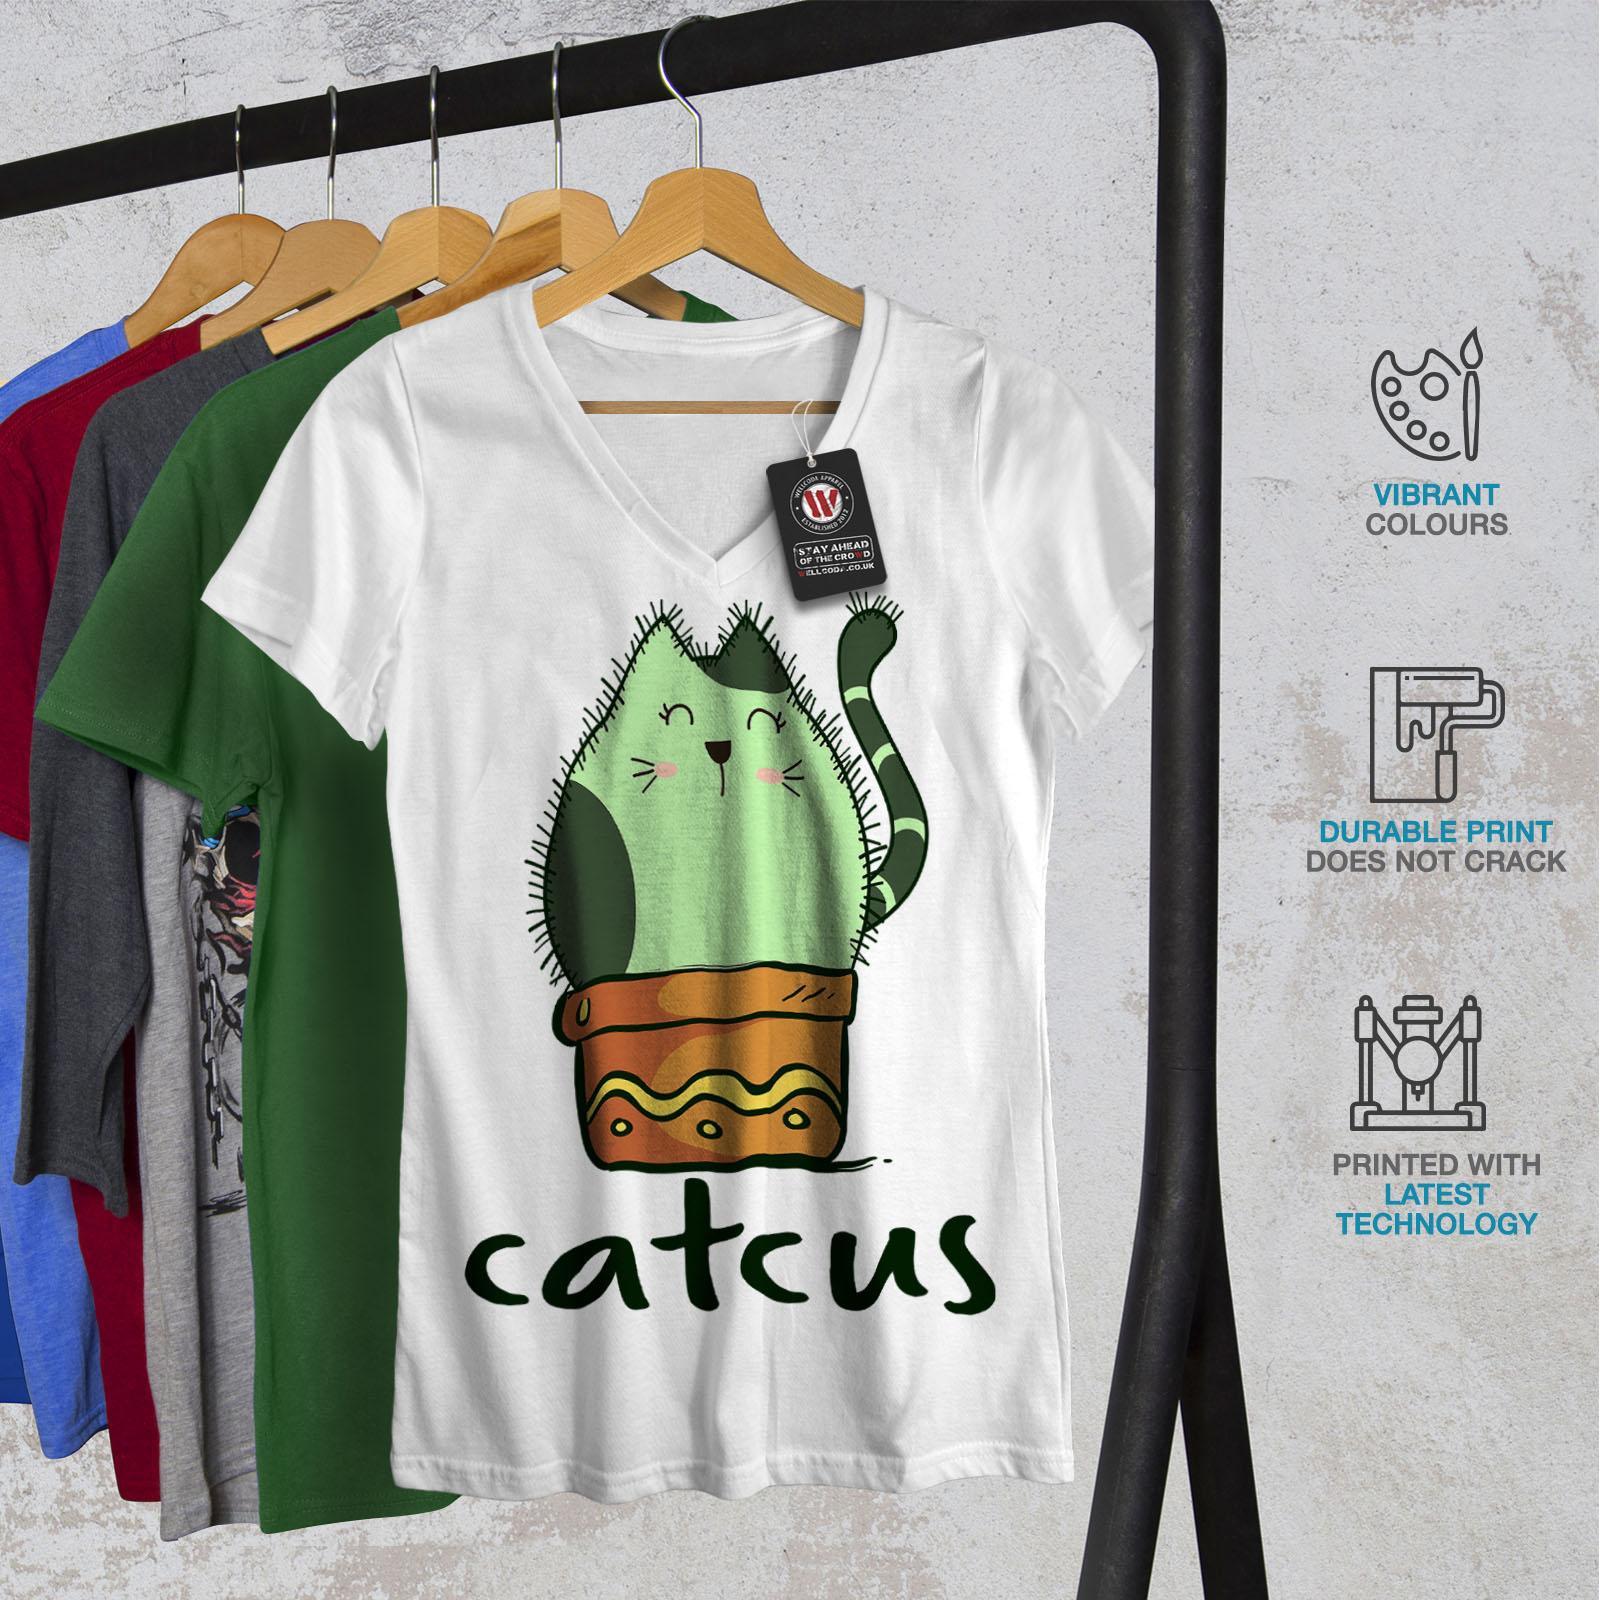 Wellcoda-Cat-Cactus-Womens-V-Neck-T-shirt-Funny-Animal-Graphic-Design-Tee thumbnail 8